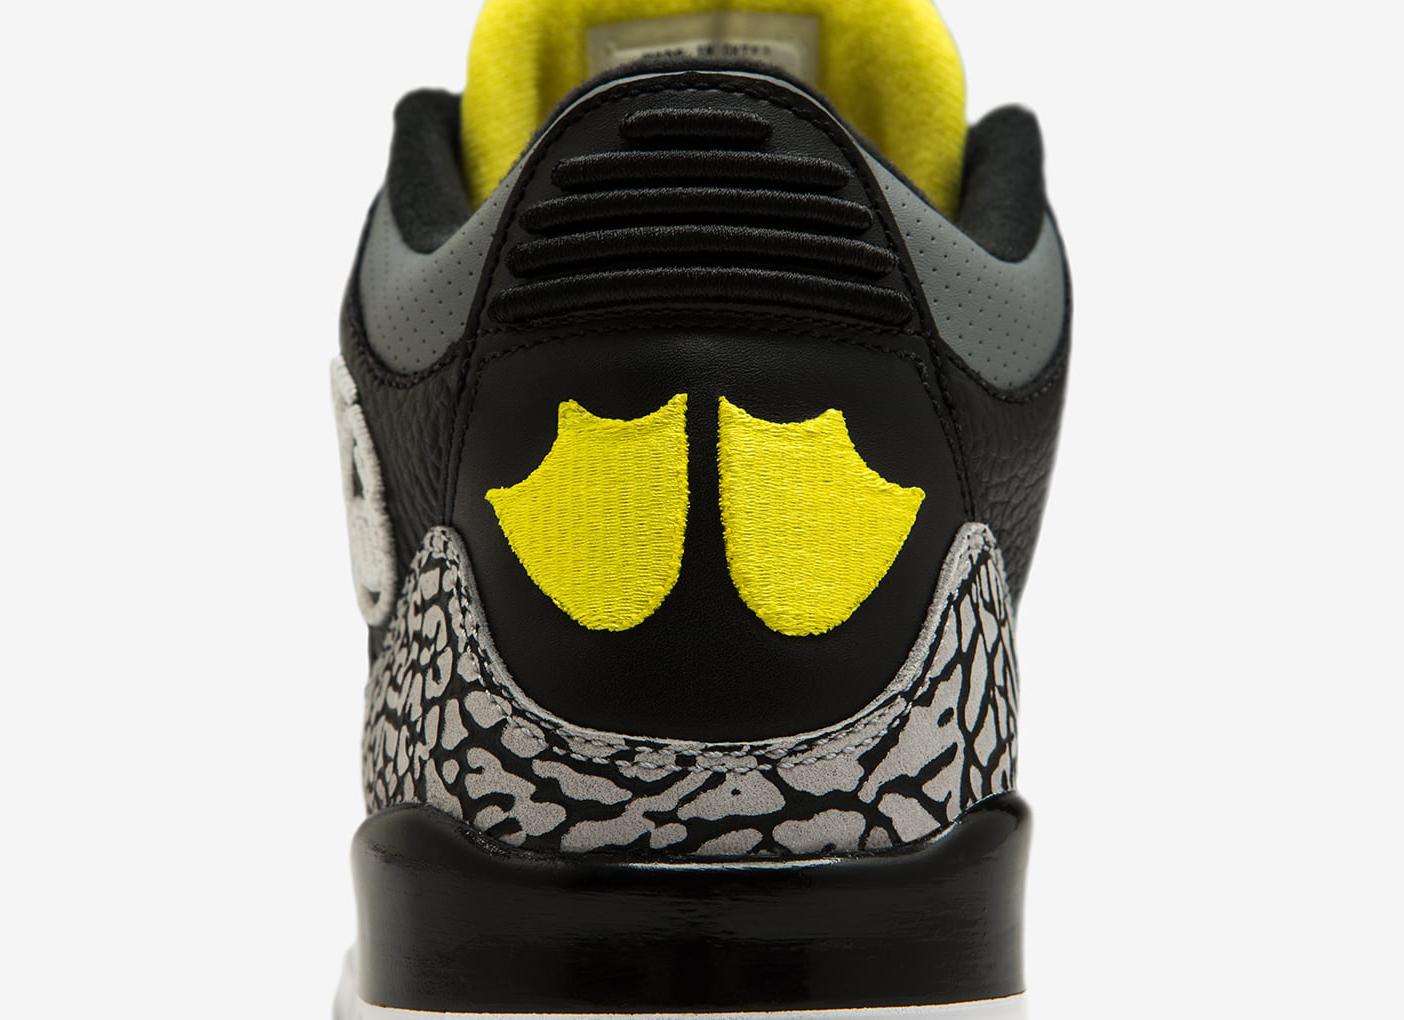 Pit Crew Jordan 3 Heel